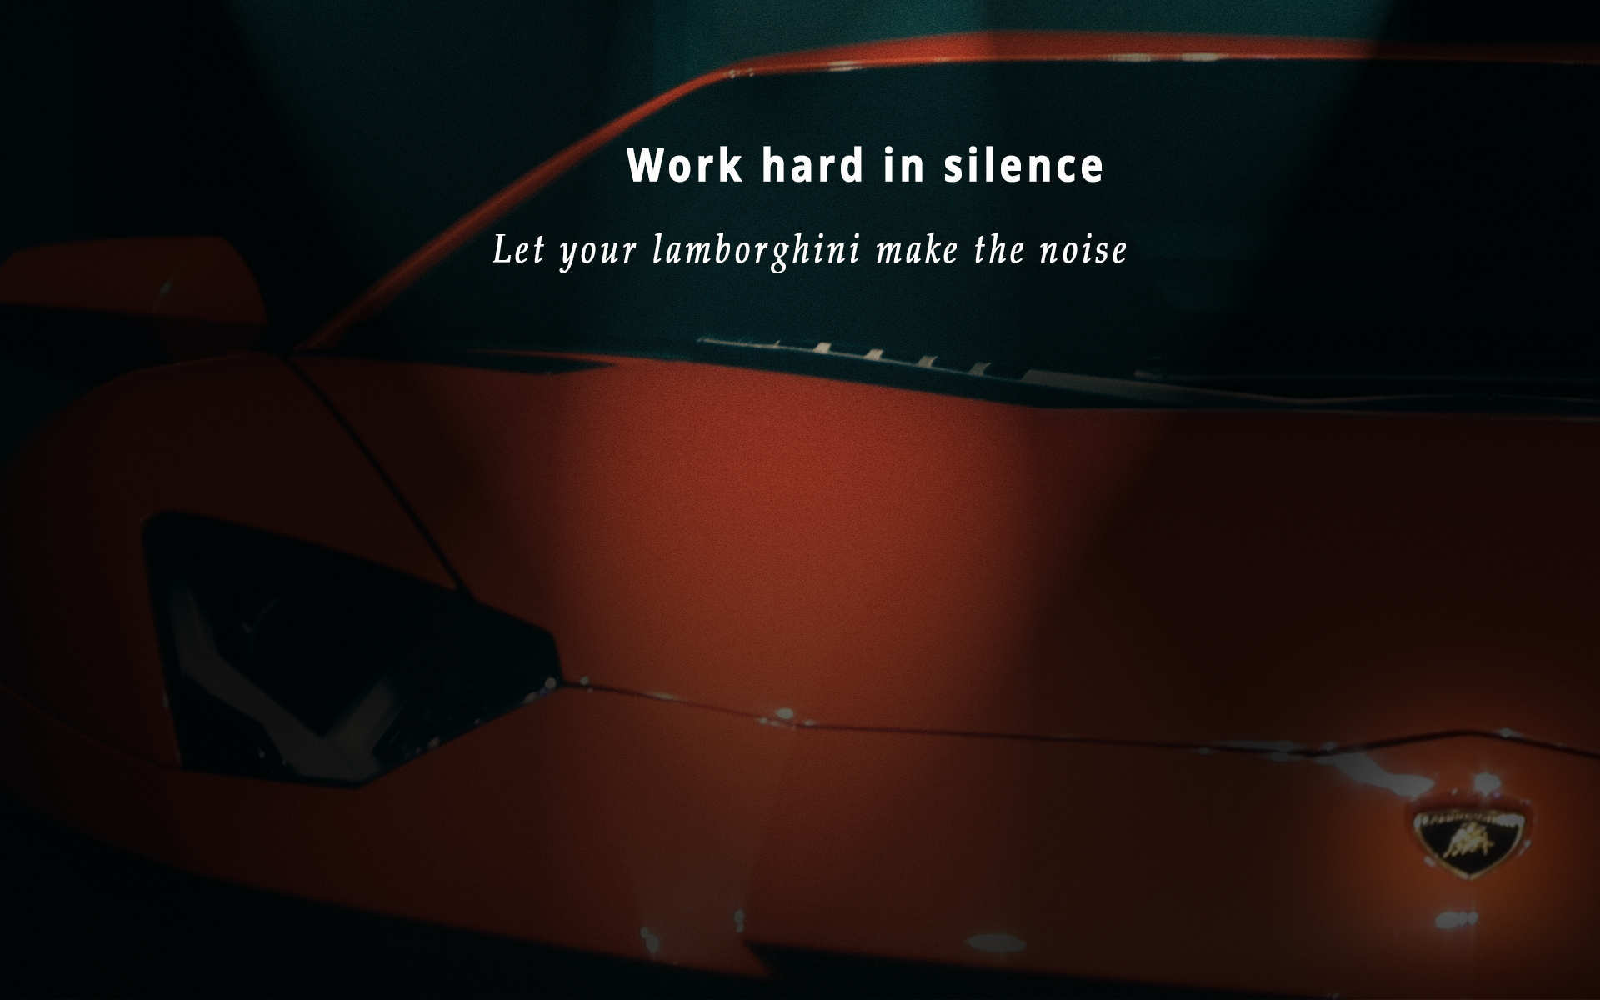 Work Hard In Silence Motivational Wallpaper For Desktop Quotationwalls